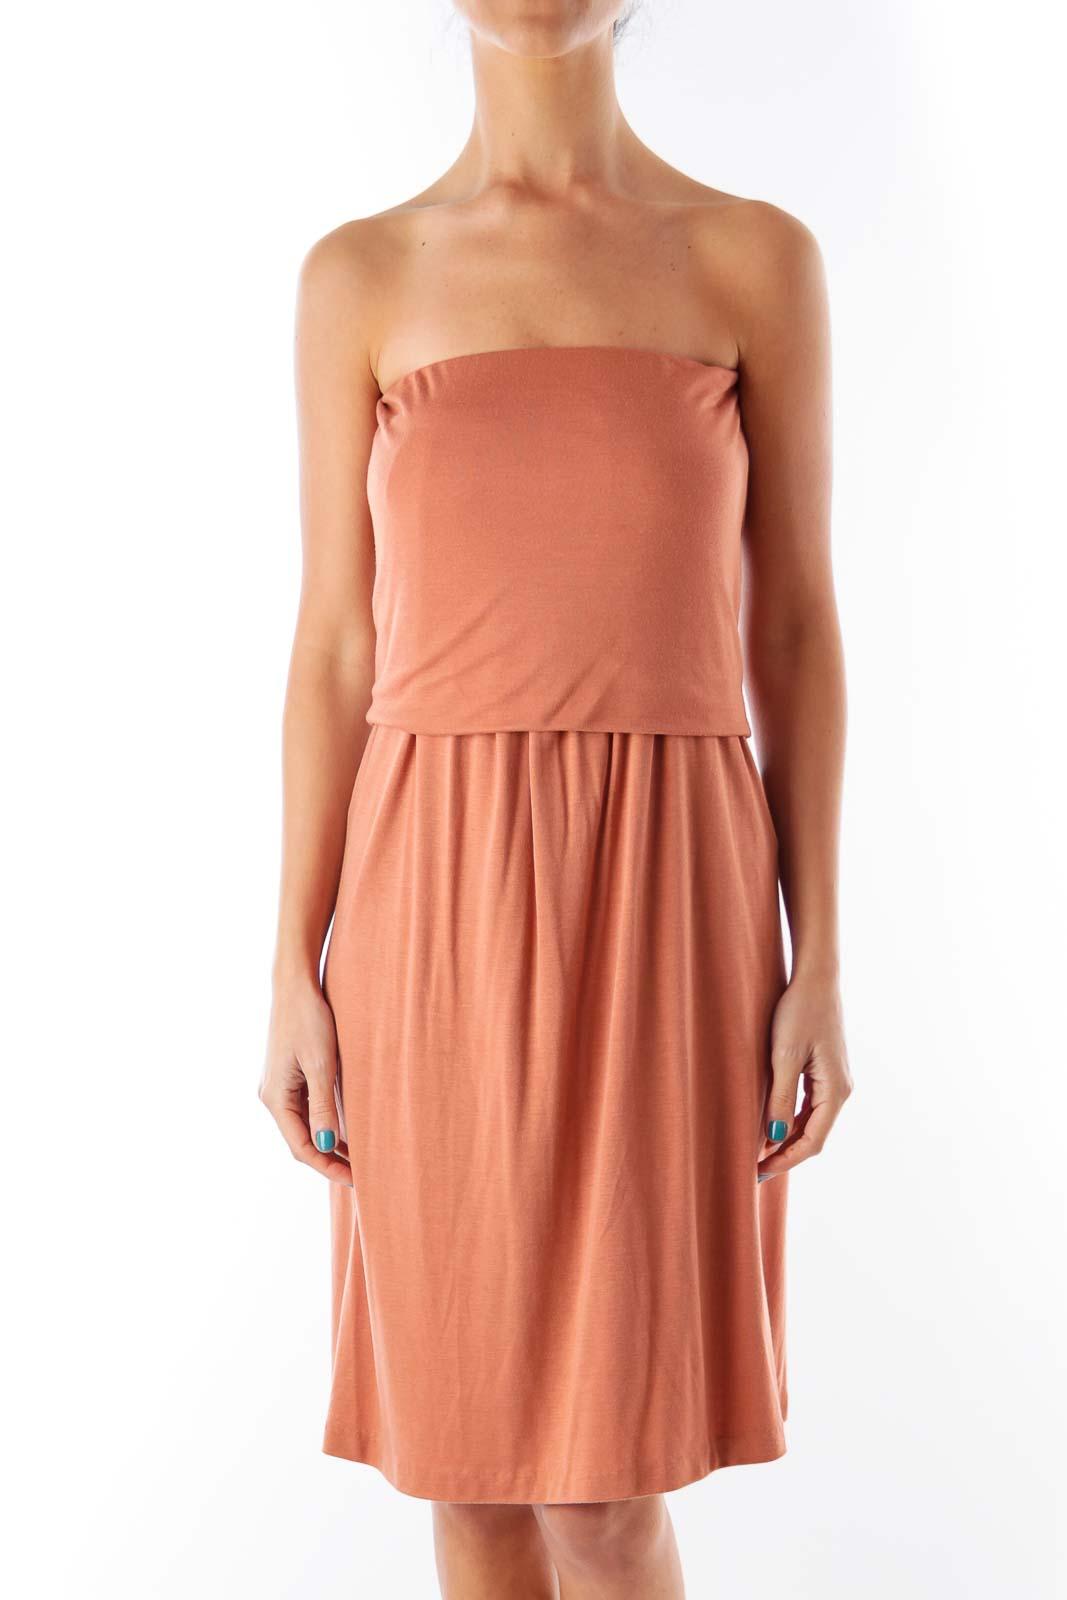 Brown Strapless Mini Dress Front